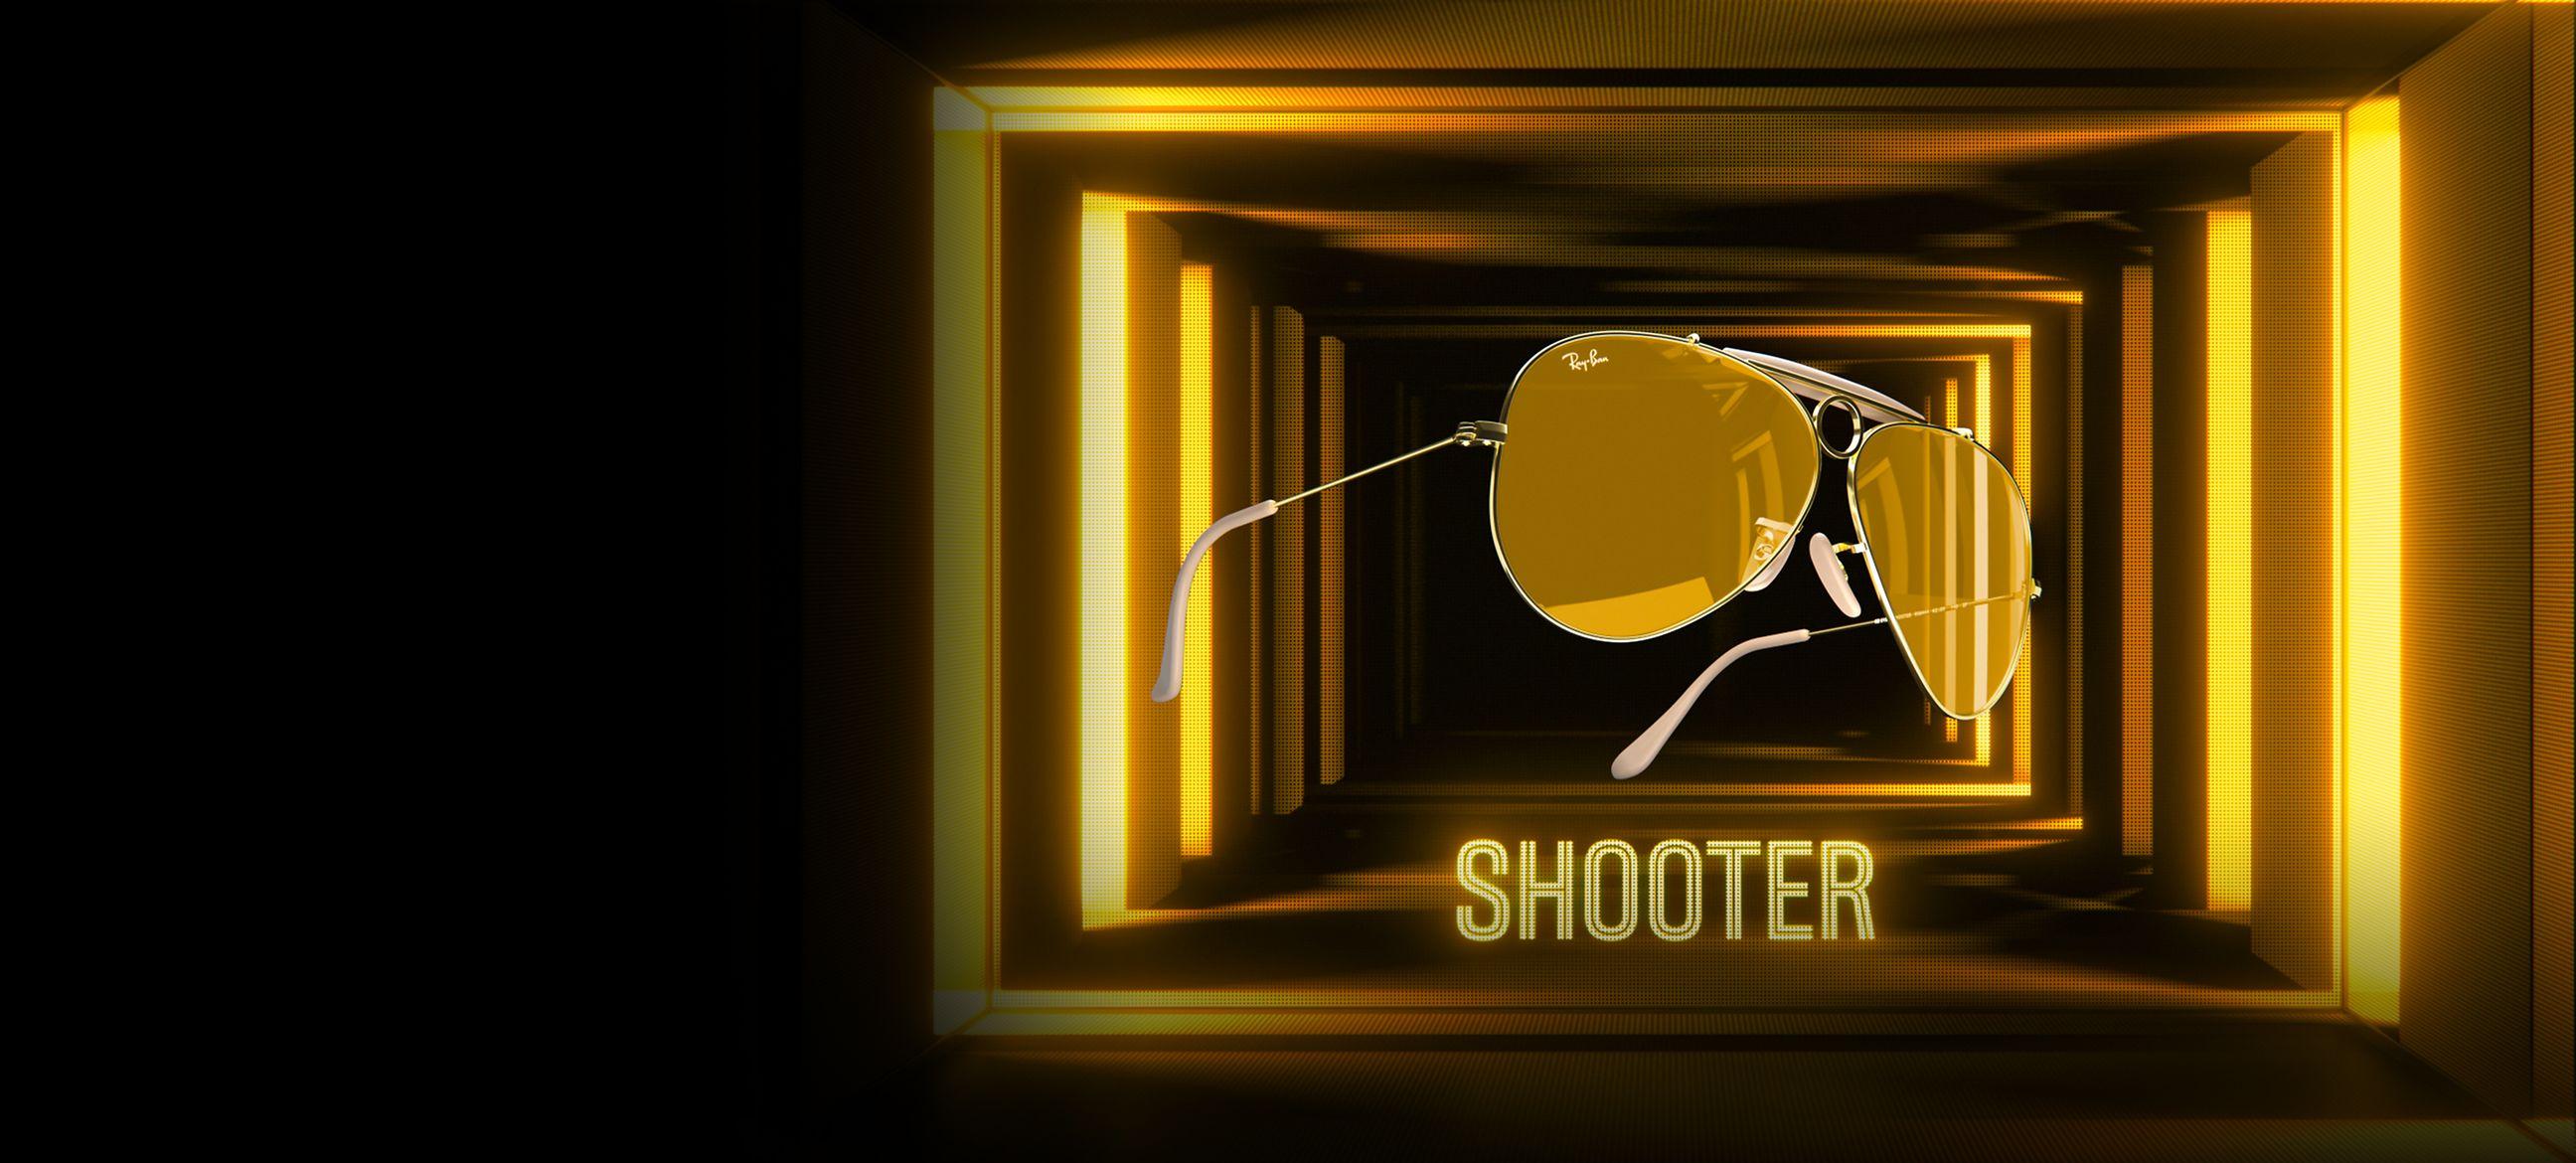 RB_PDPP_Ambermatic_Shooter (1)